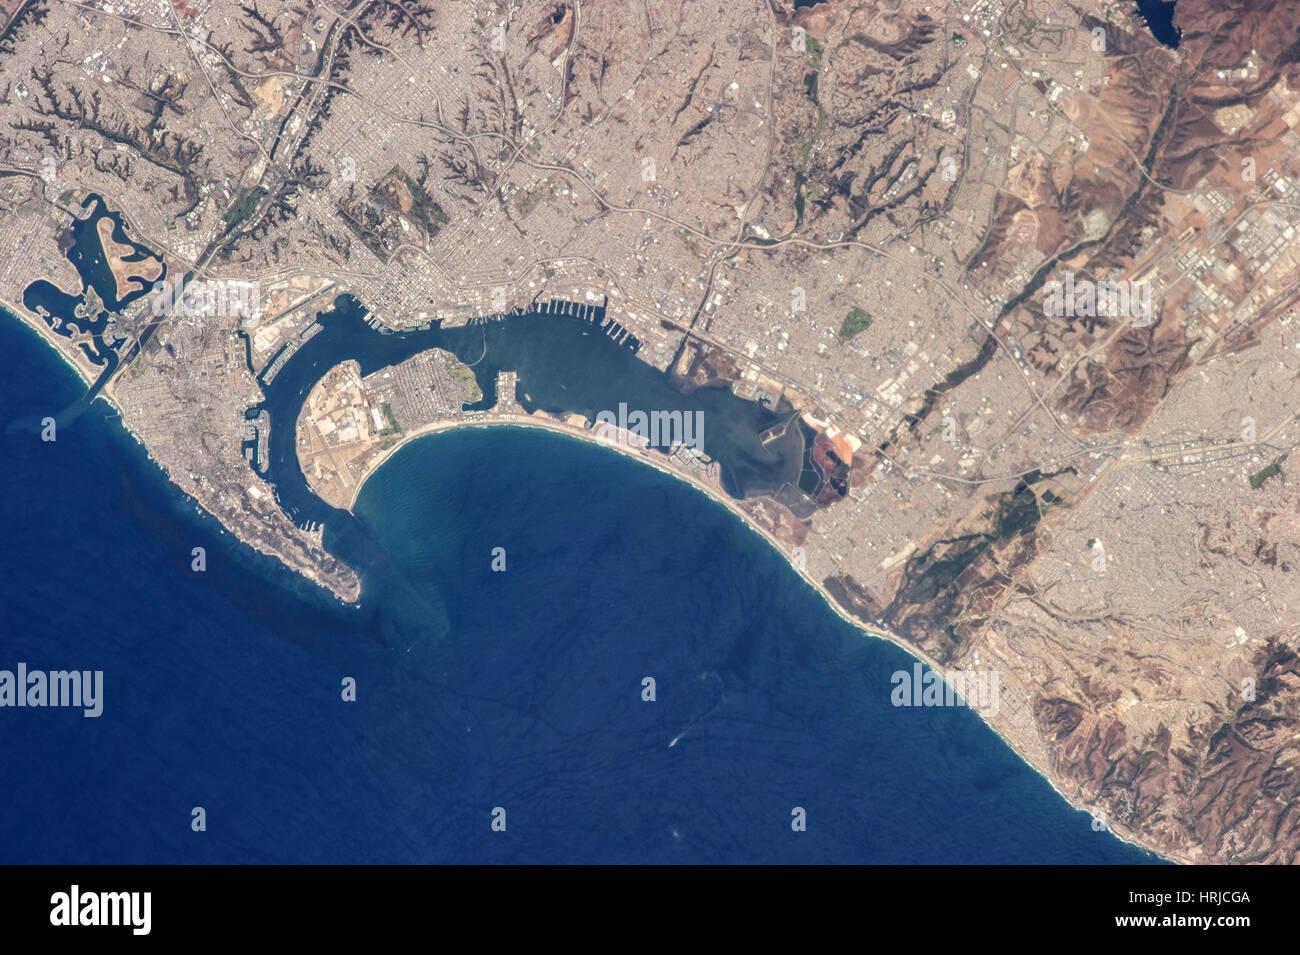 San Diego and Tijuana - Stock Image